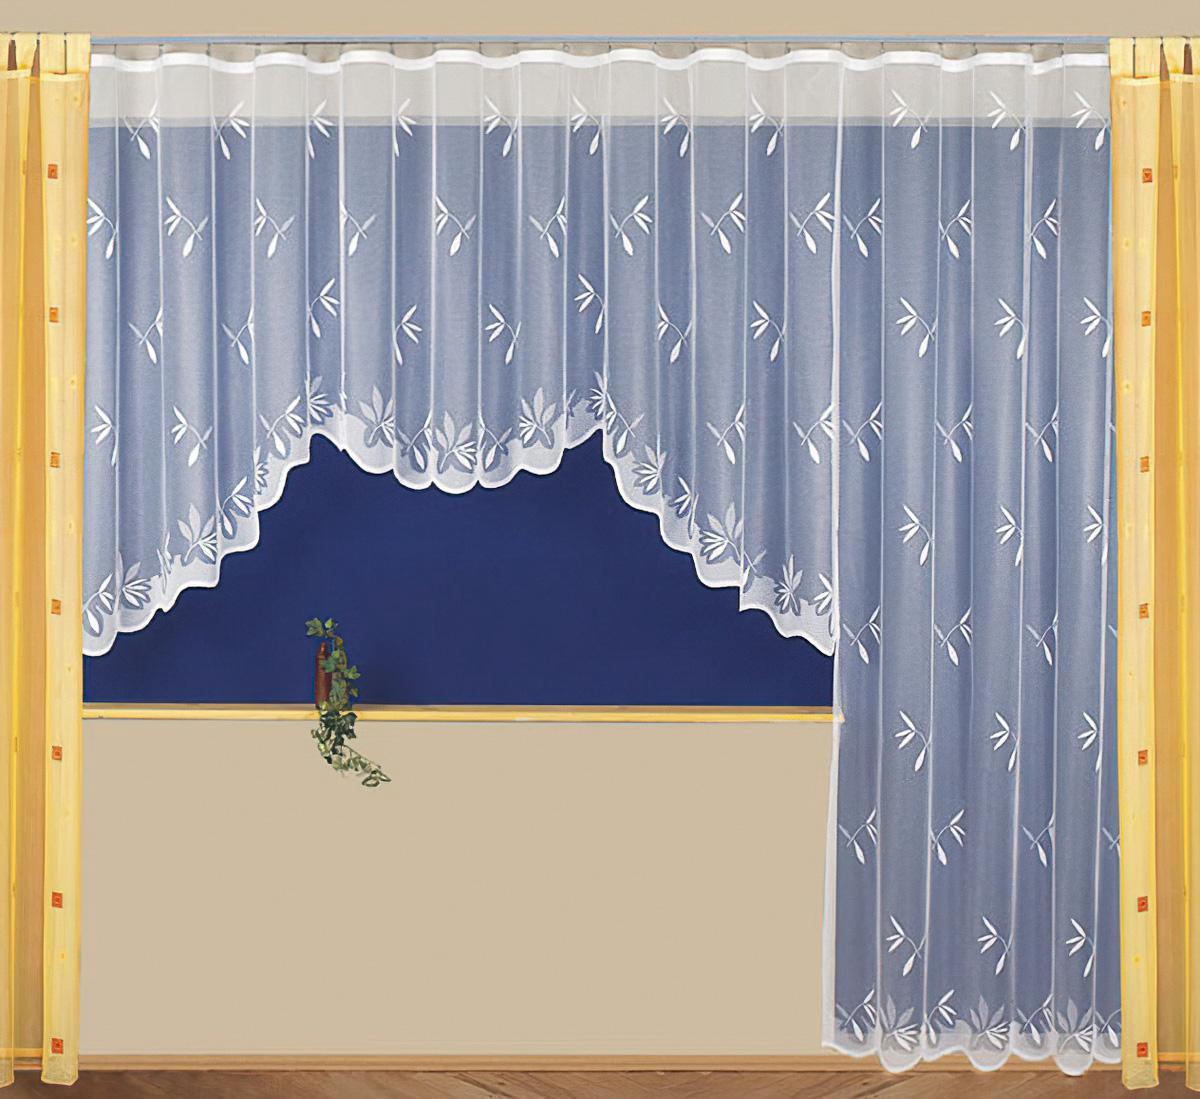 Tylex kusová záclona SELMA jednobarevná bílá, výška 250 cm x šířka 170 cm (na dveře)